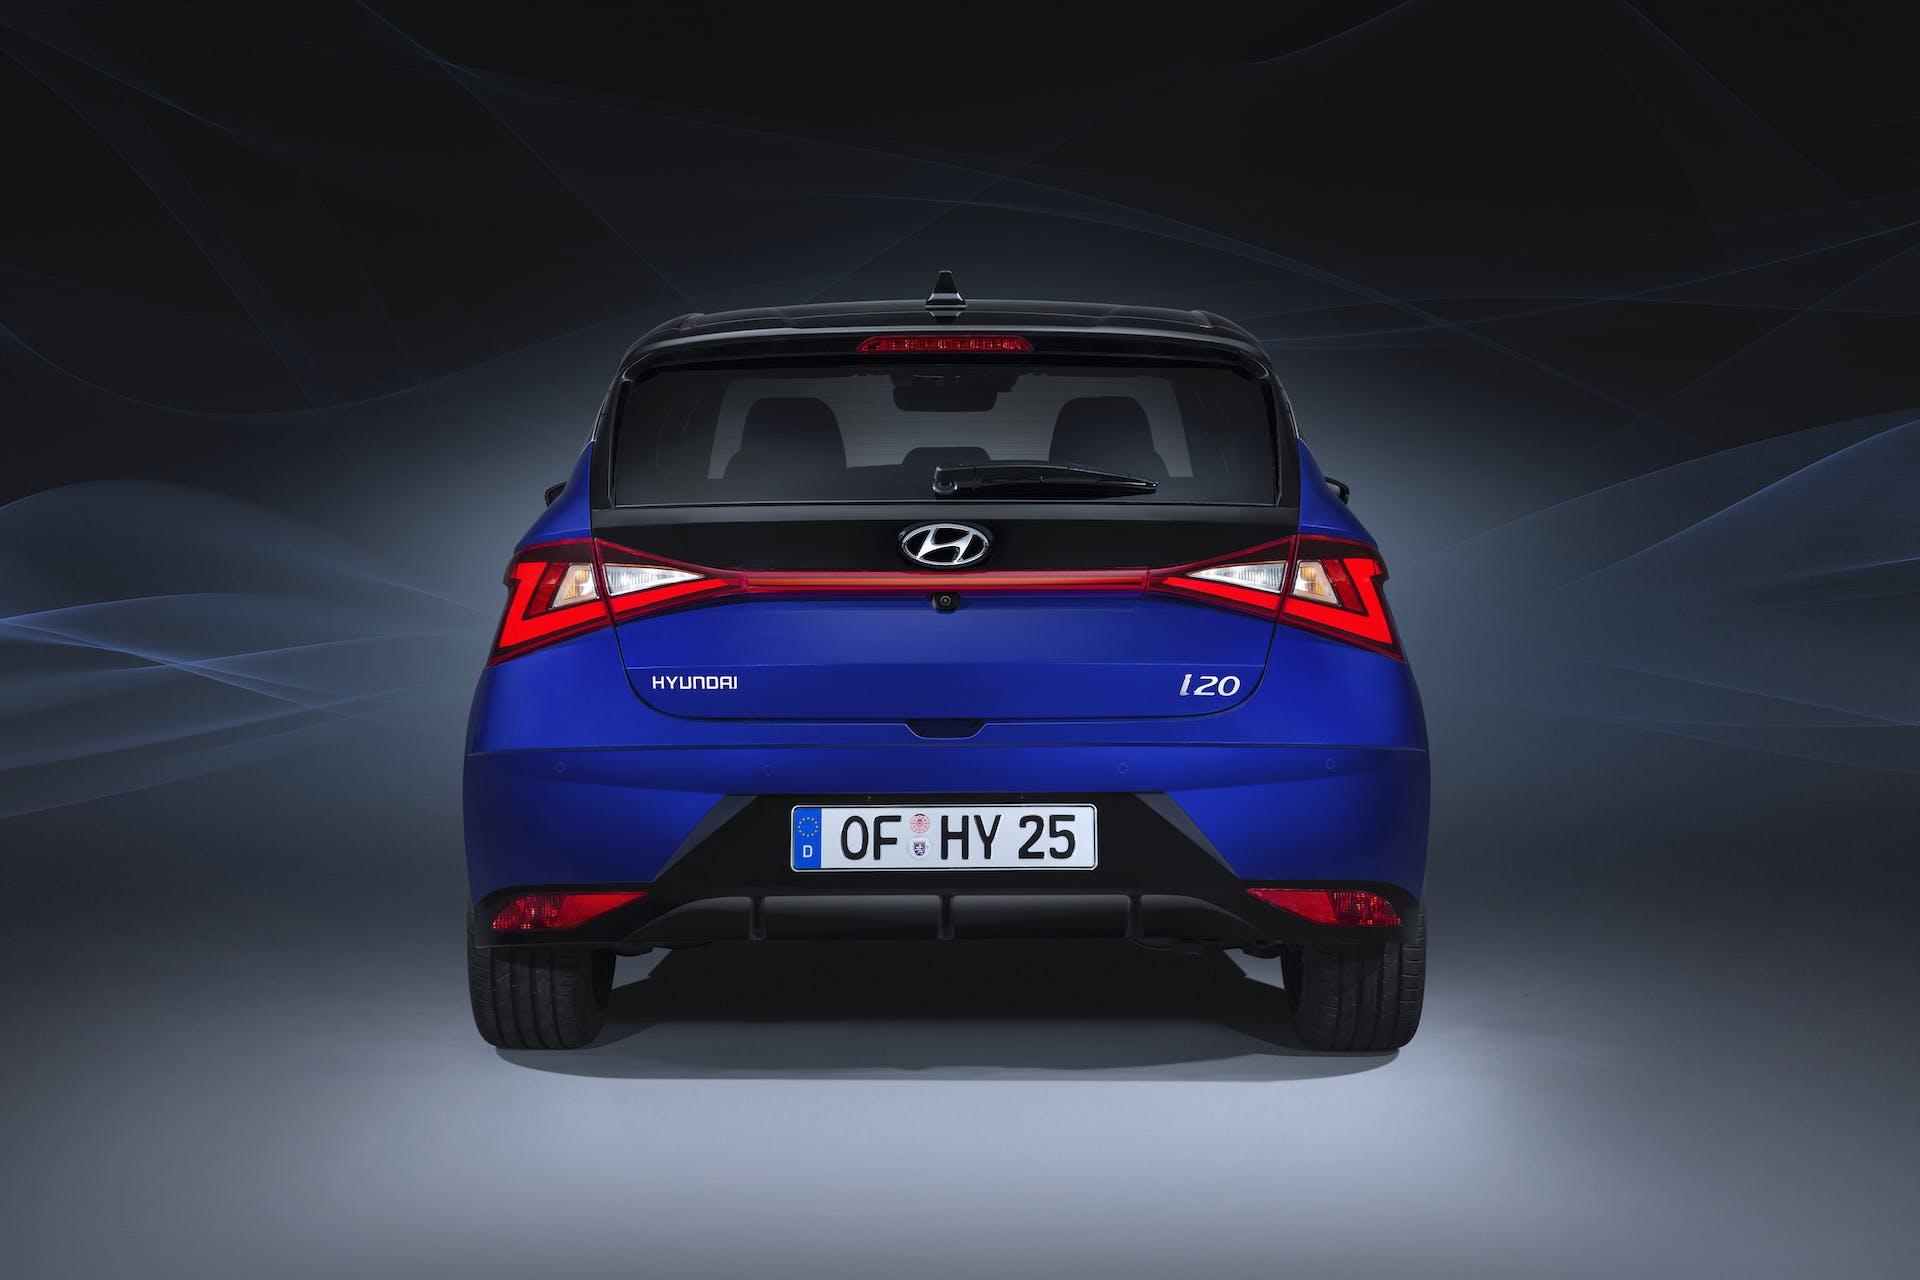 Nuova Hyundai i20 vista posteriore